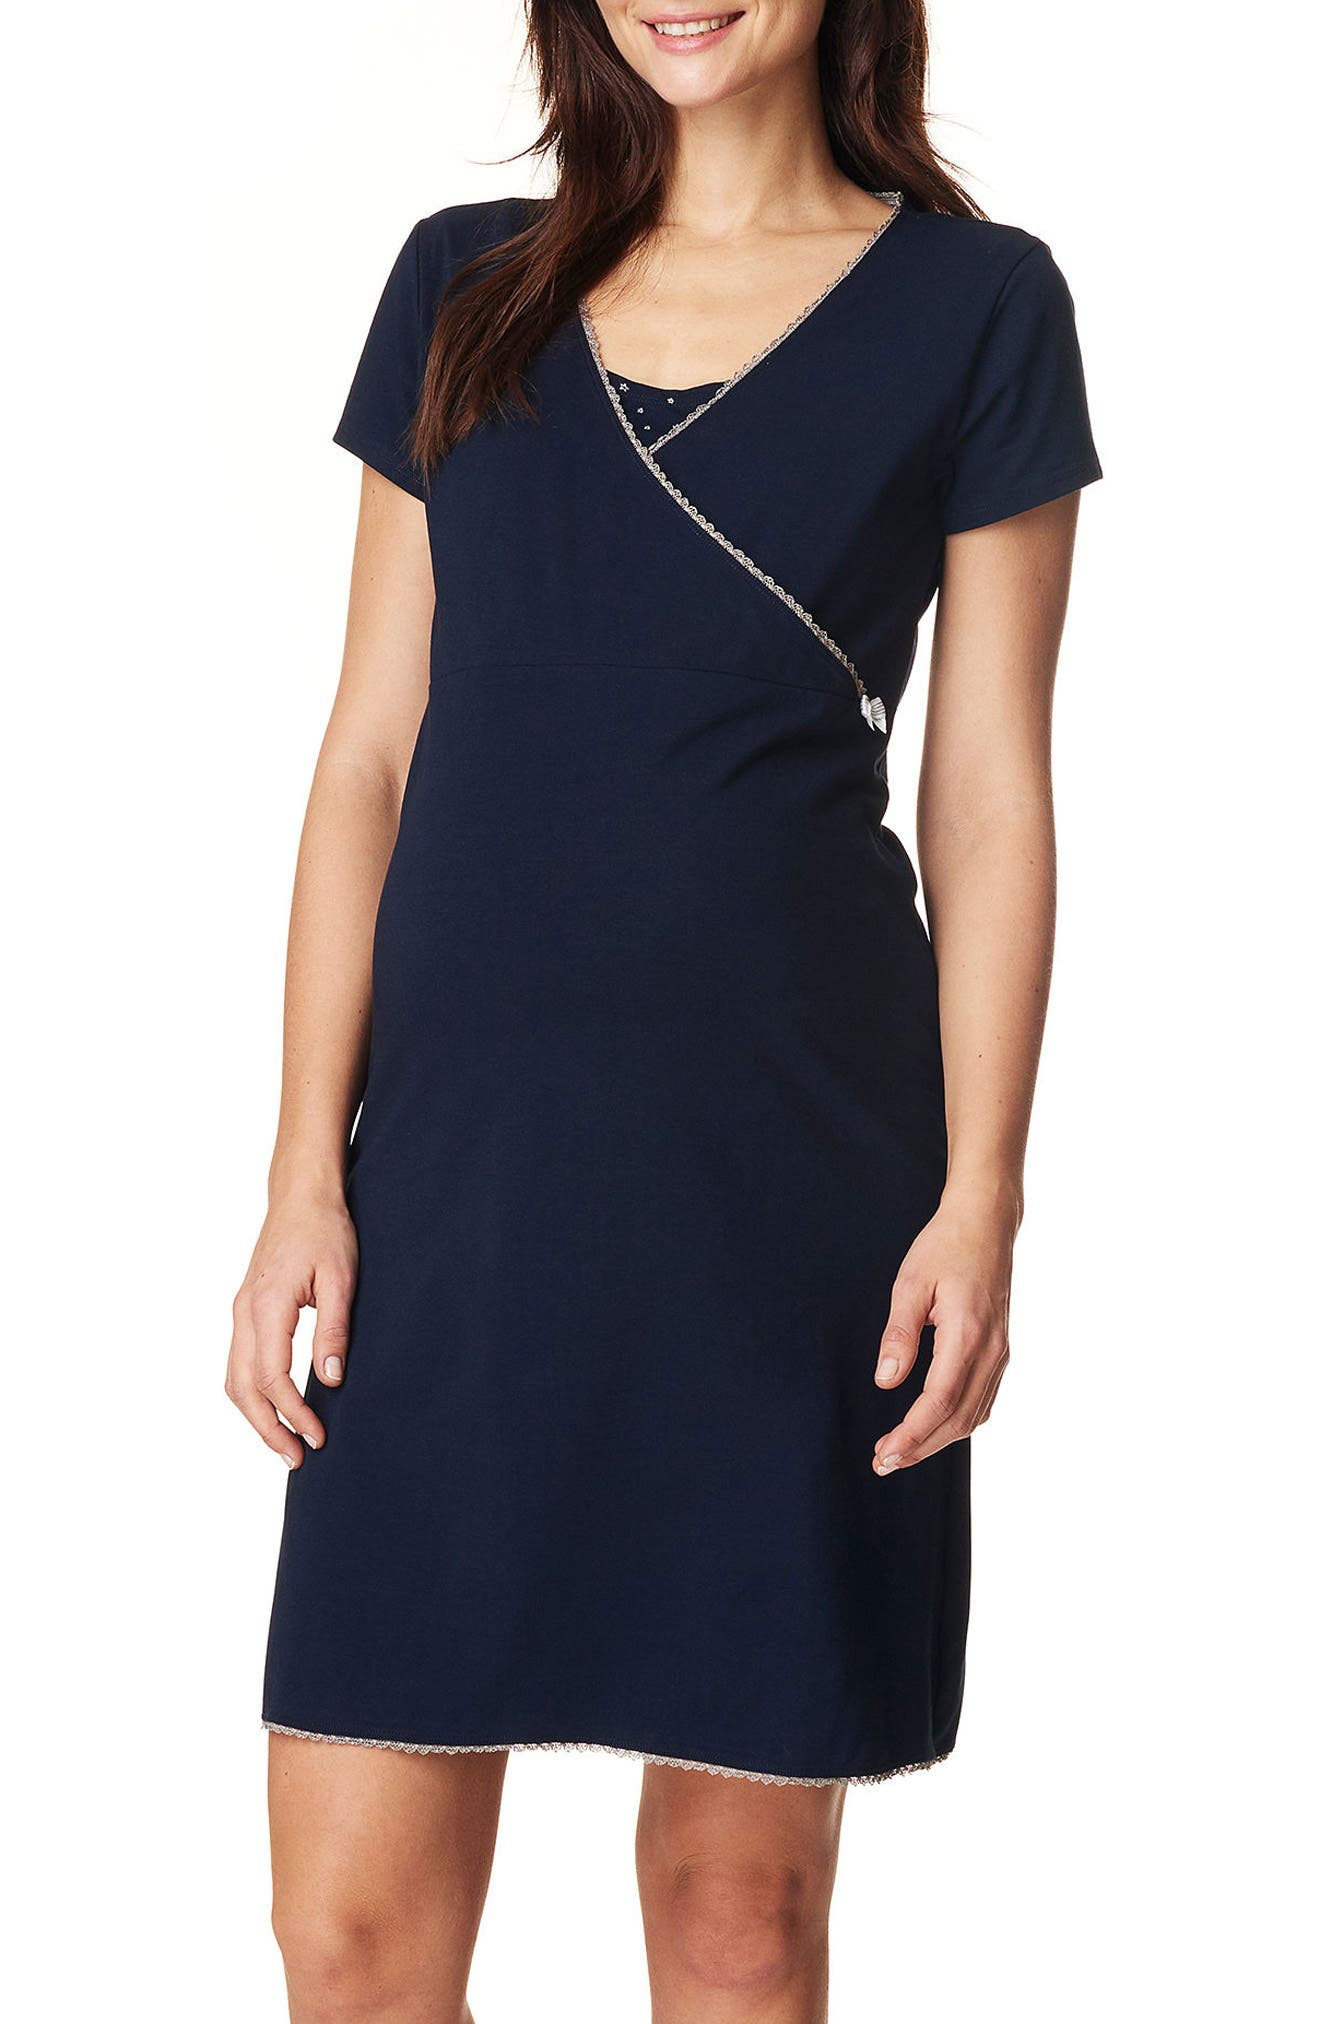 Alternate Image 1 Selected - Noppies Kimm Maternity/Nursing Jersey Dress